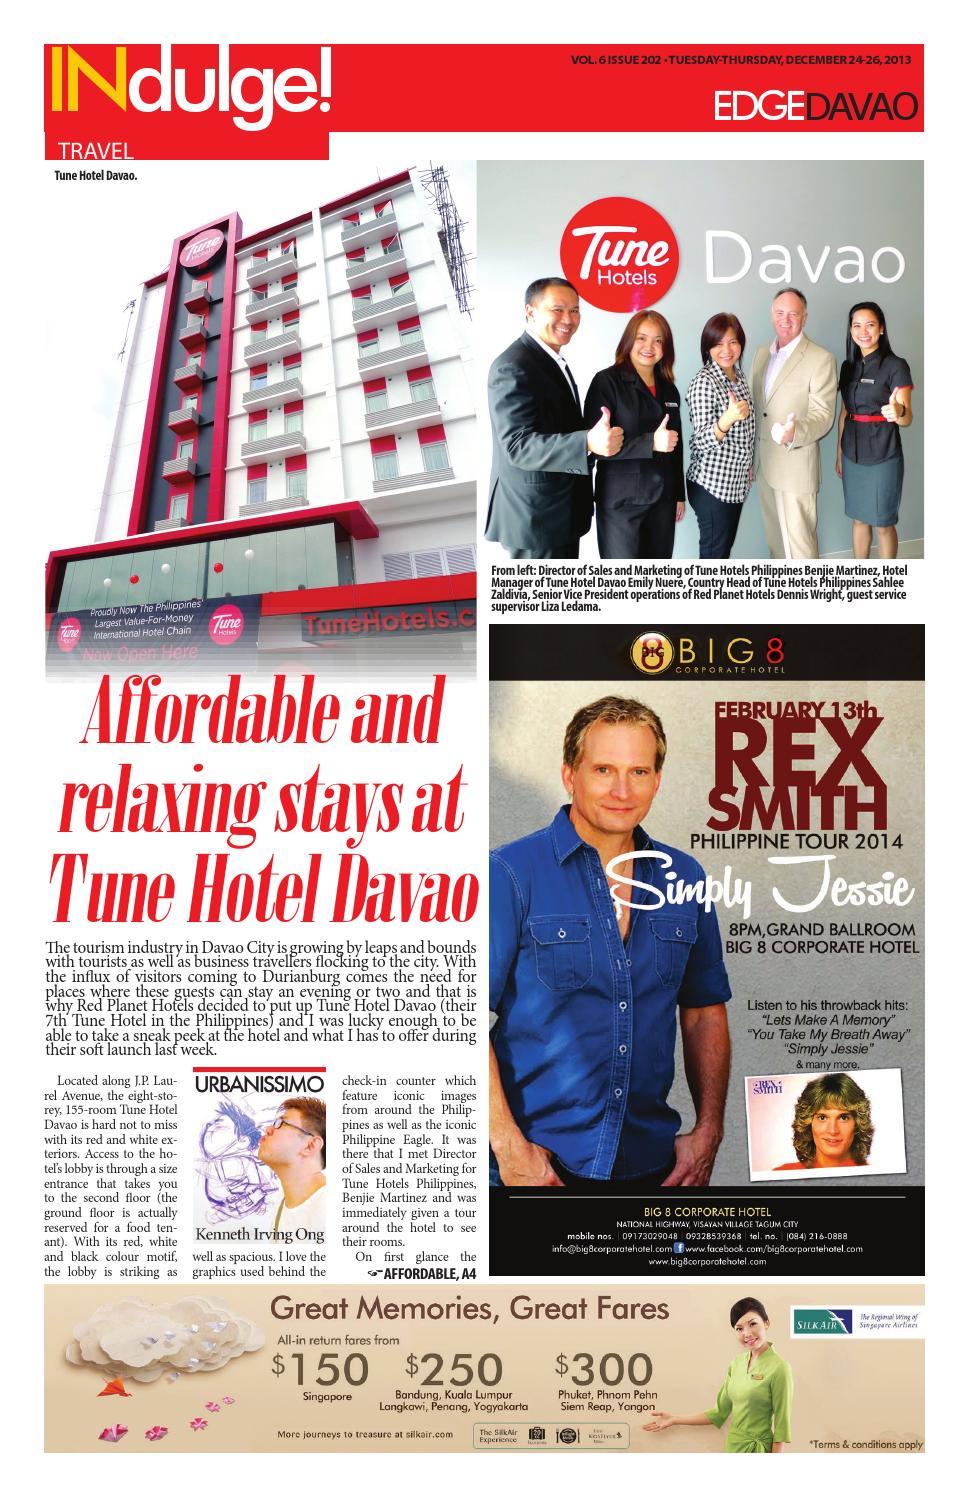 Edge Davao 6 Issue 202